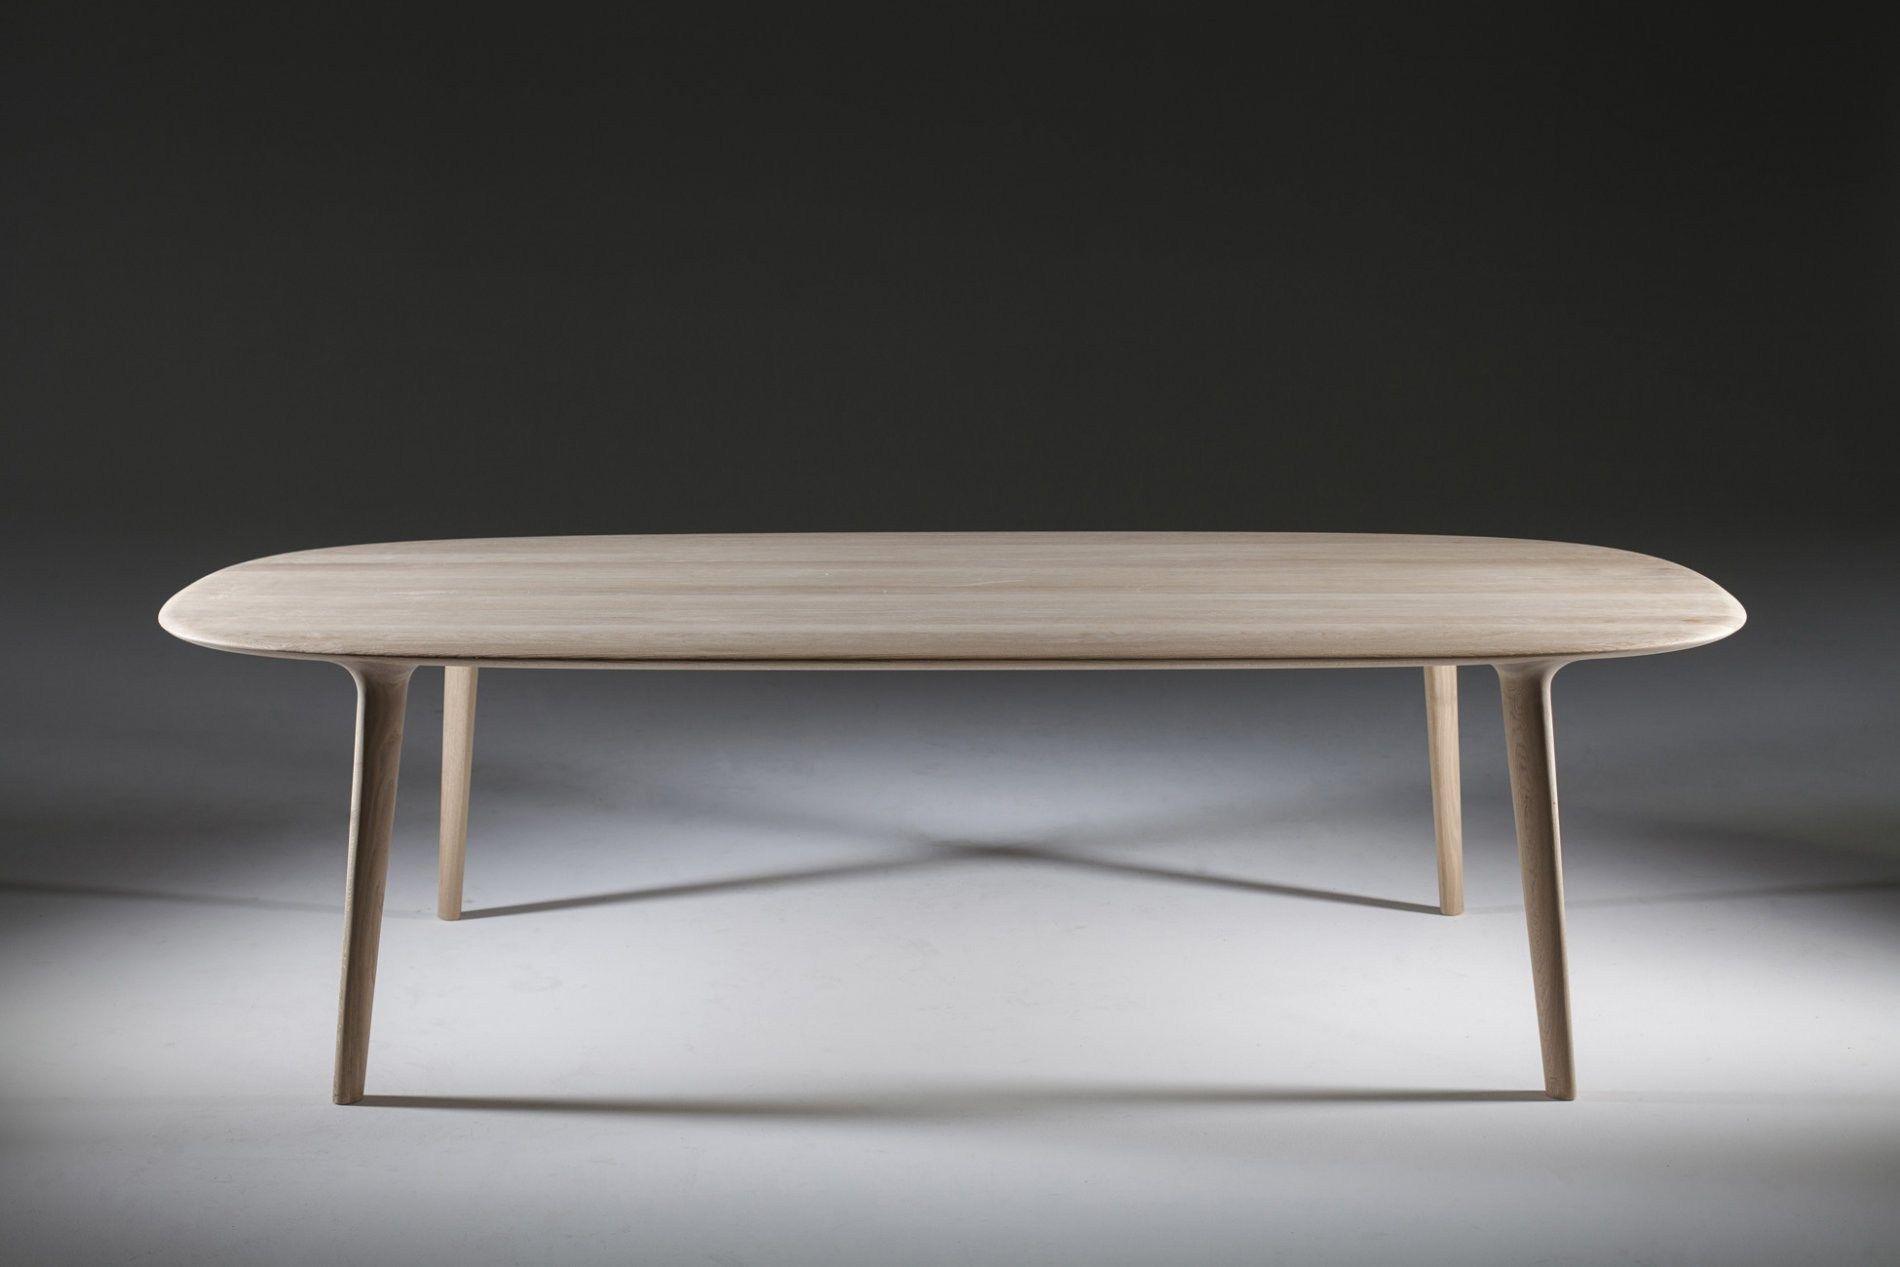 Table ovale en bois luc collection luc by artisan design for Table ovale en bois